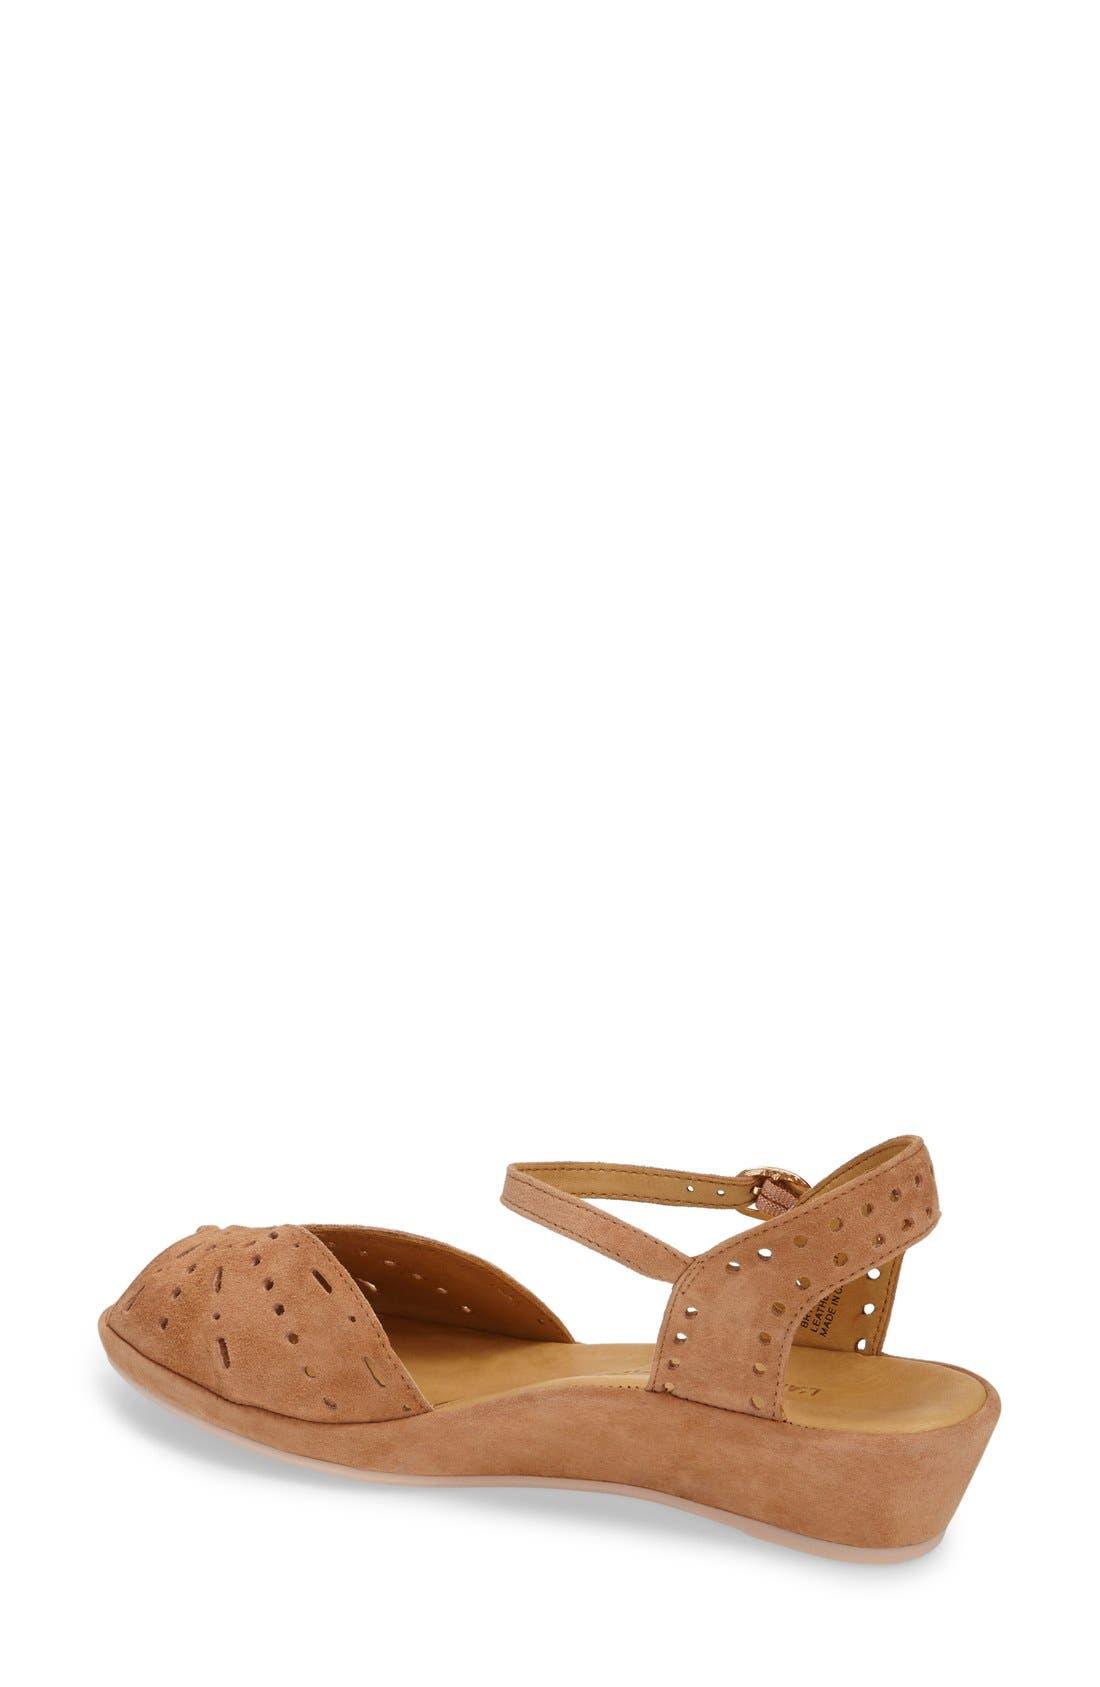 Alternate Image 2  - L'Amour des Pieds 'Brenn' Ankle Strap Sandal (Women)